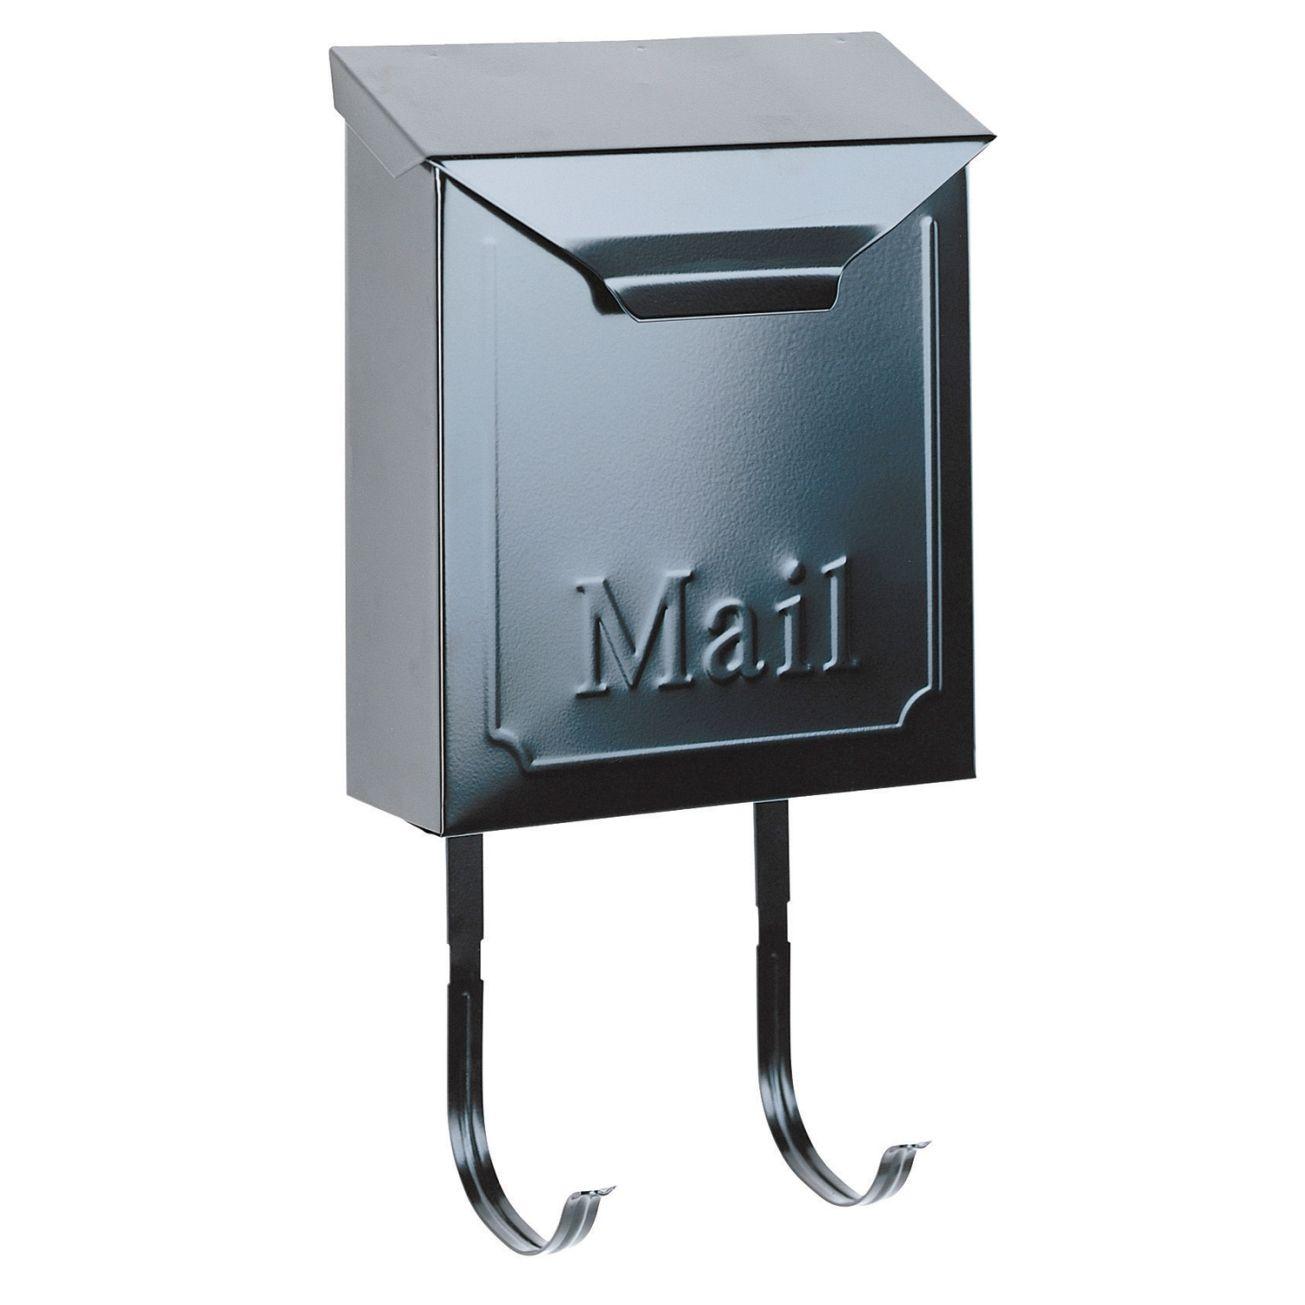 Solar Group Locking Vertical City Mailbox Thvk00000 House Mount Mailboxes Wall Mount Mailbox Mounted Mailbox Metal Mailbox